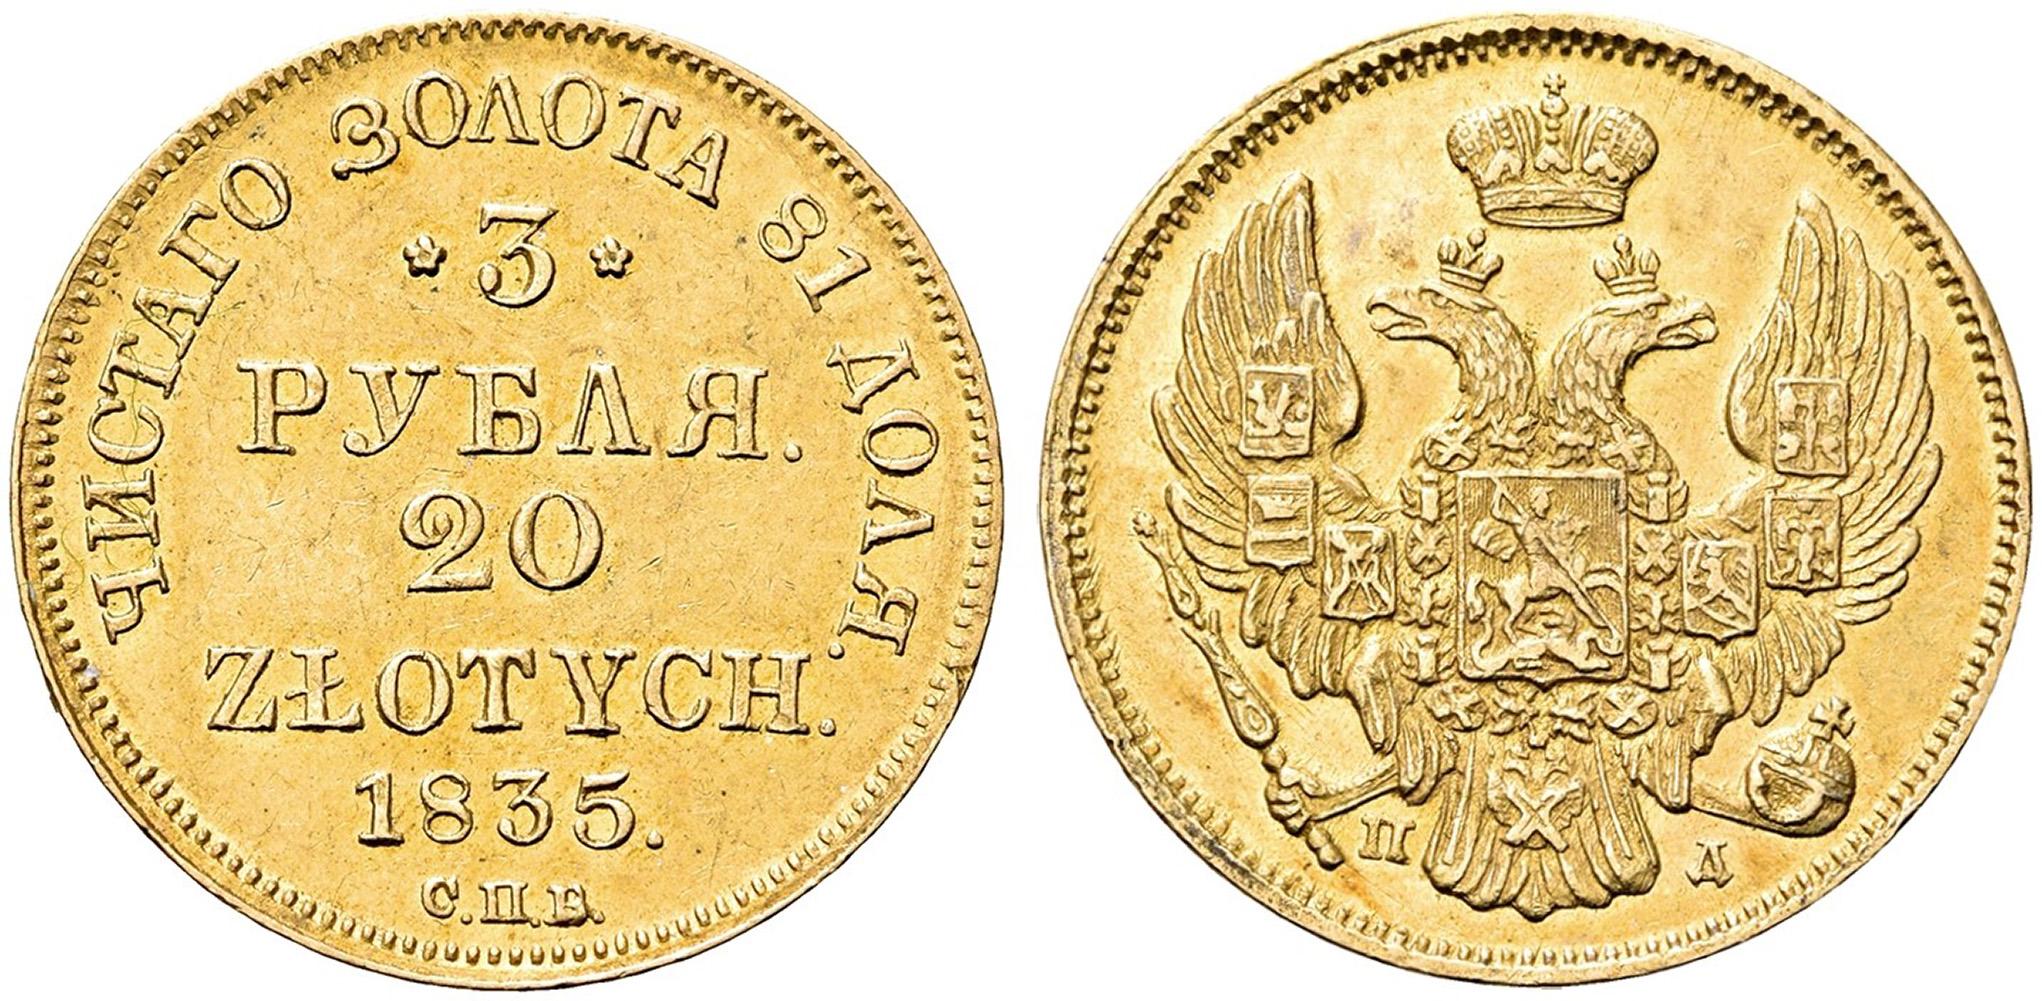 PL 20 Zloty/ 3 Rubles 1835 C.П.Б.